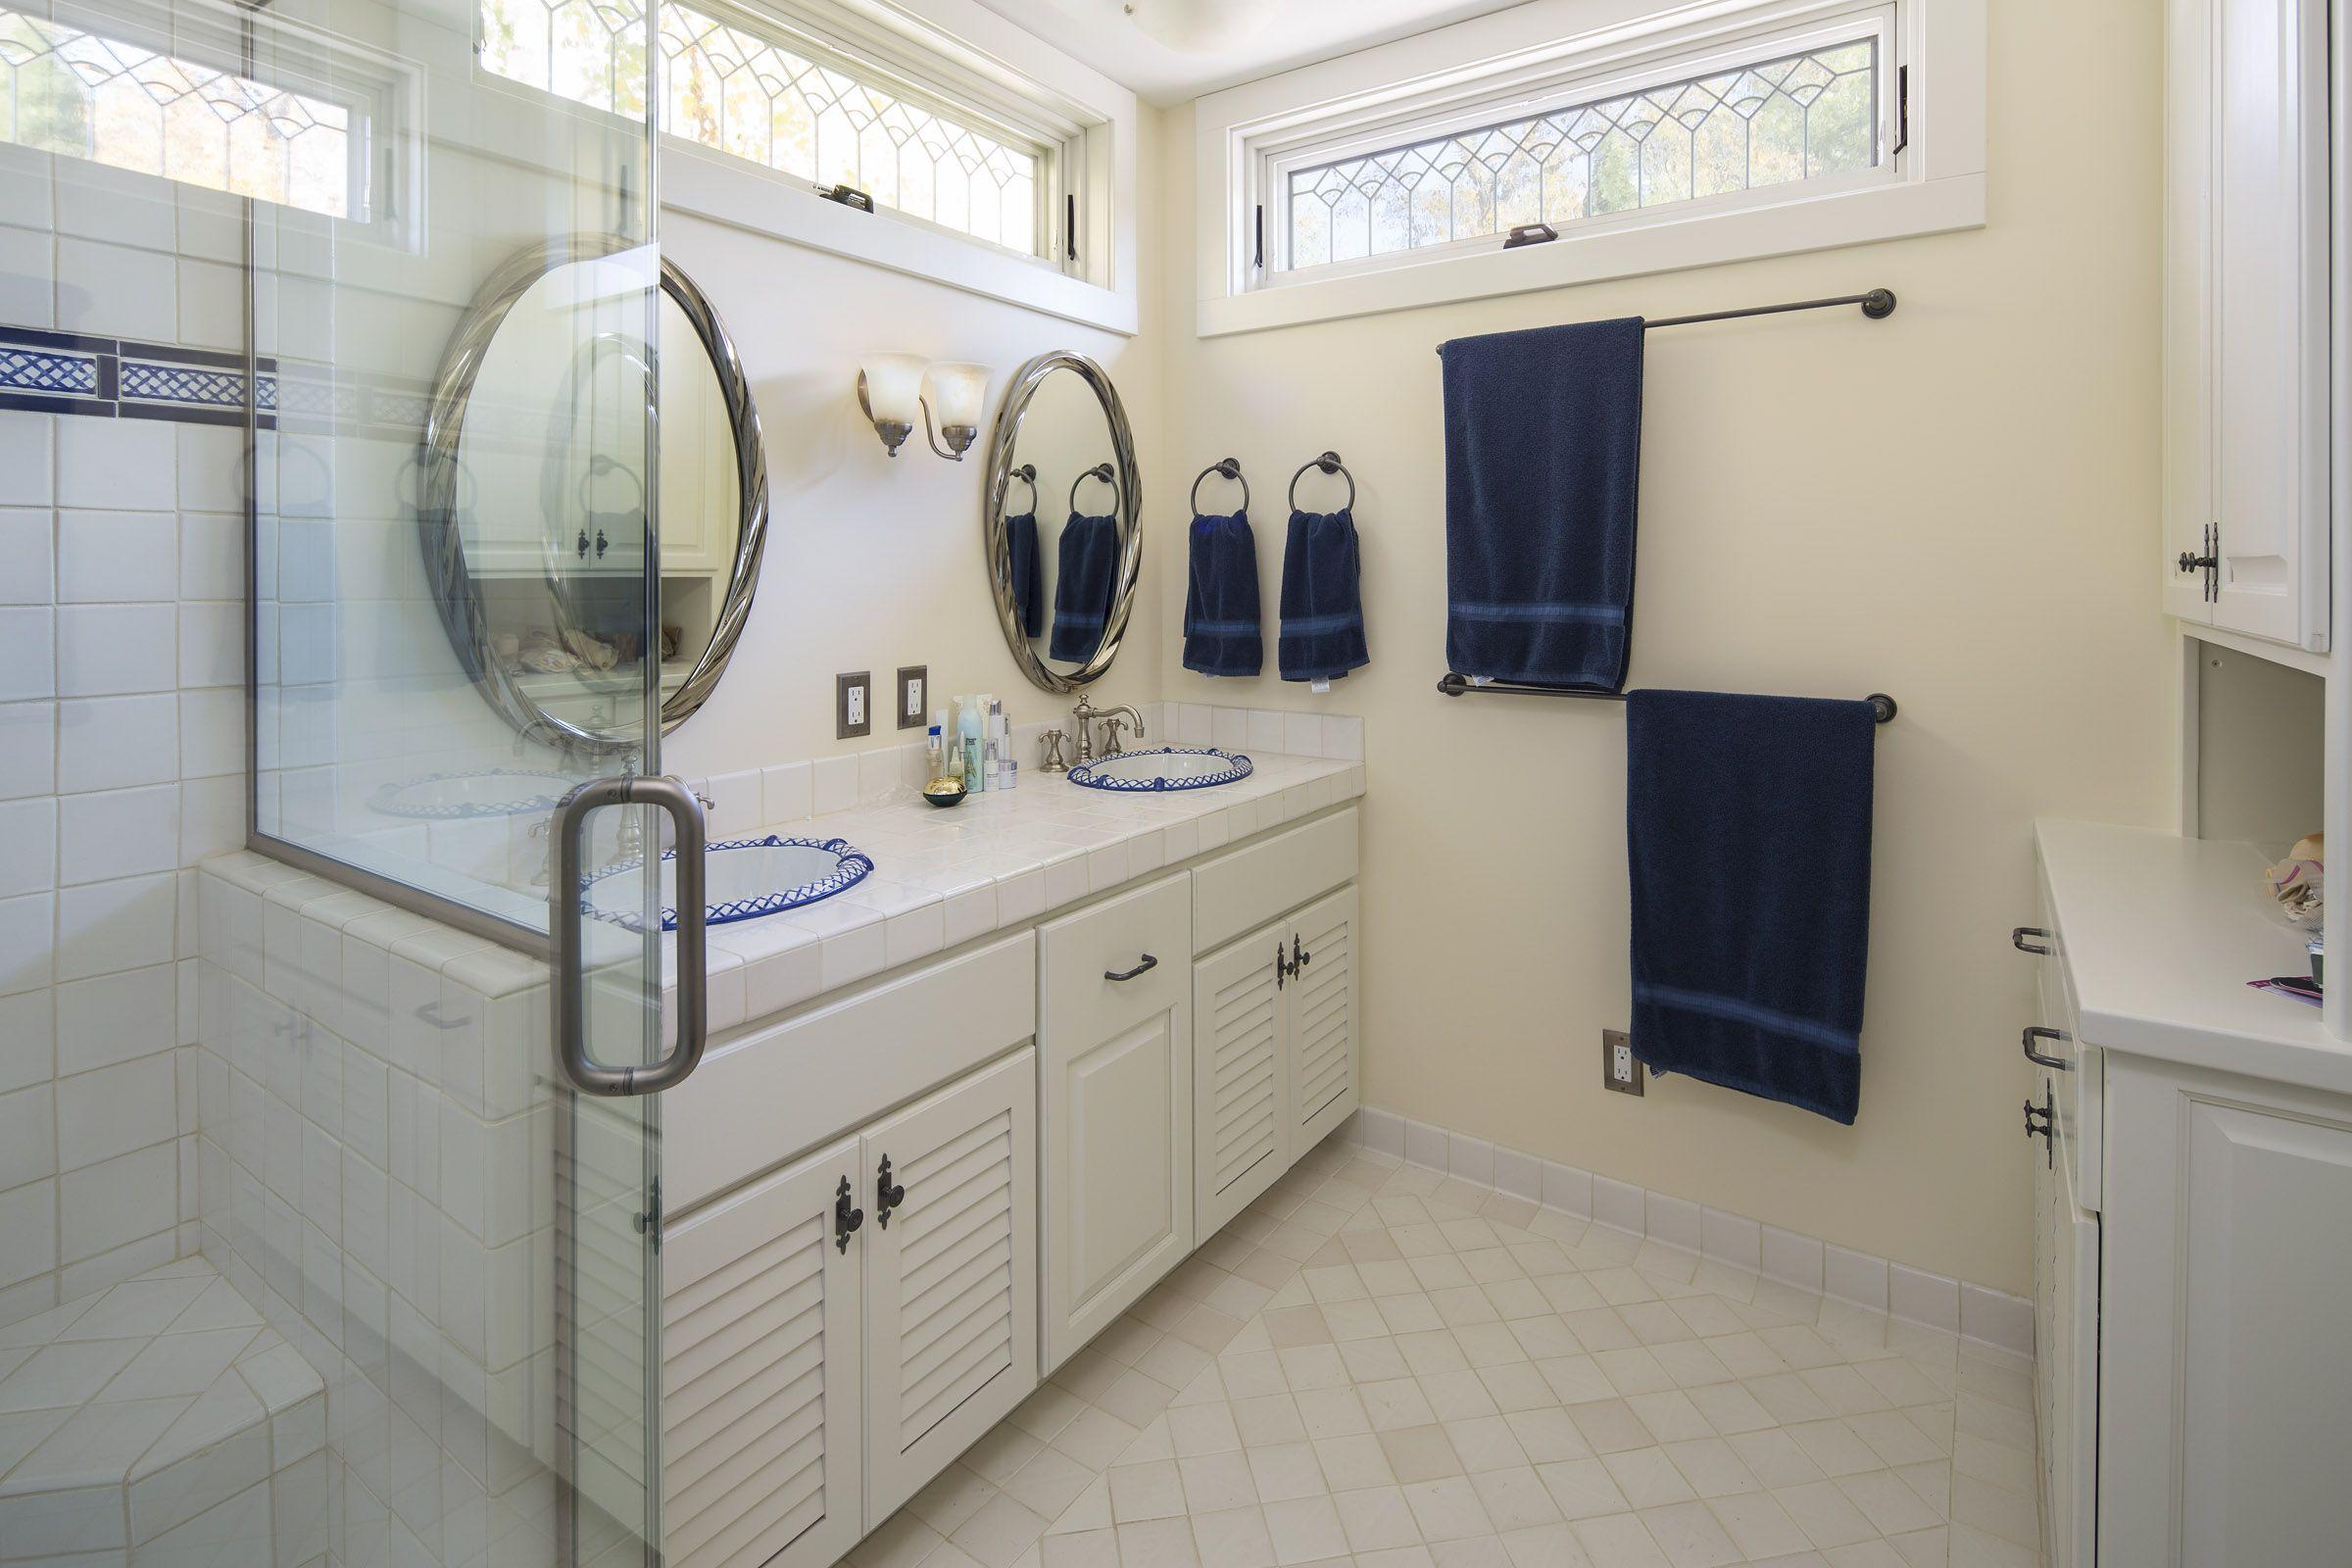 pleted luxury bathroom remodel in Minneapolis MN by Fair and